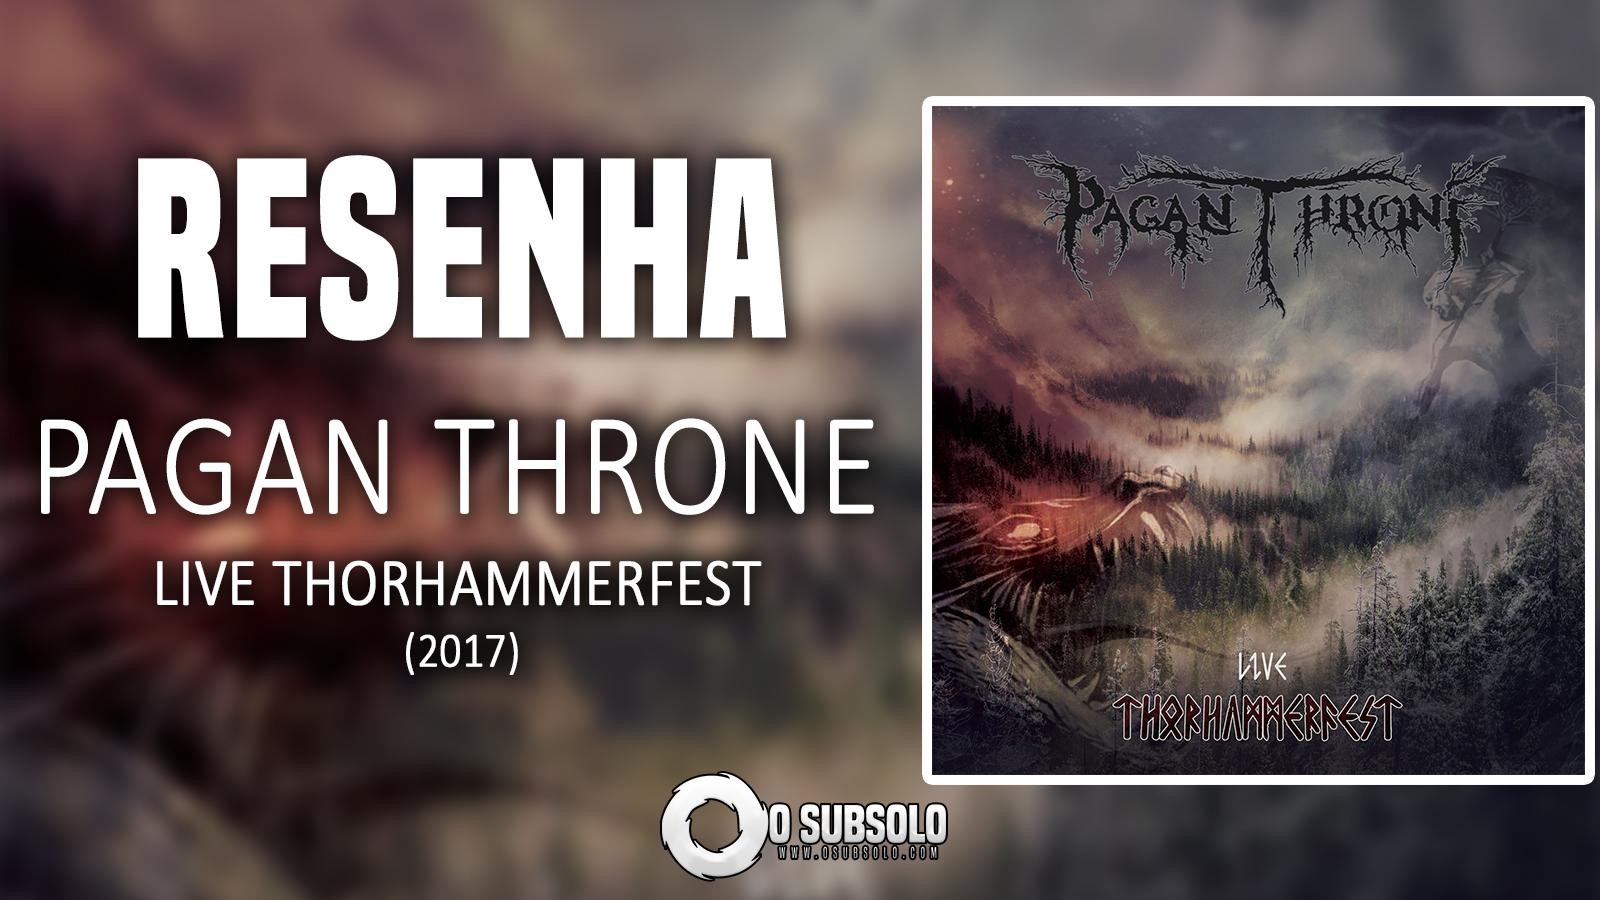 Live Thorhammerfest - Pagan Throne (2017)